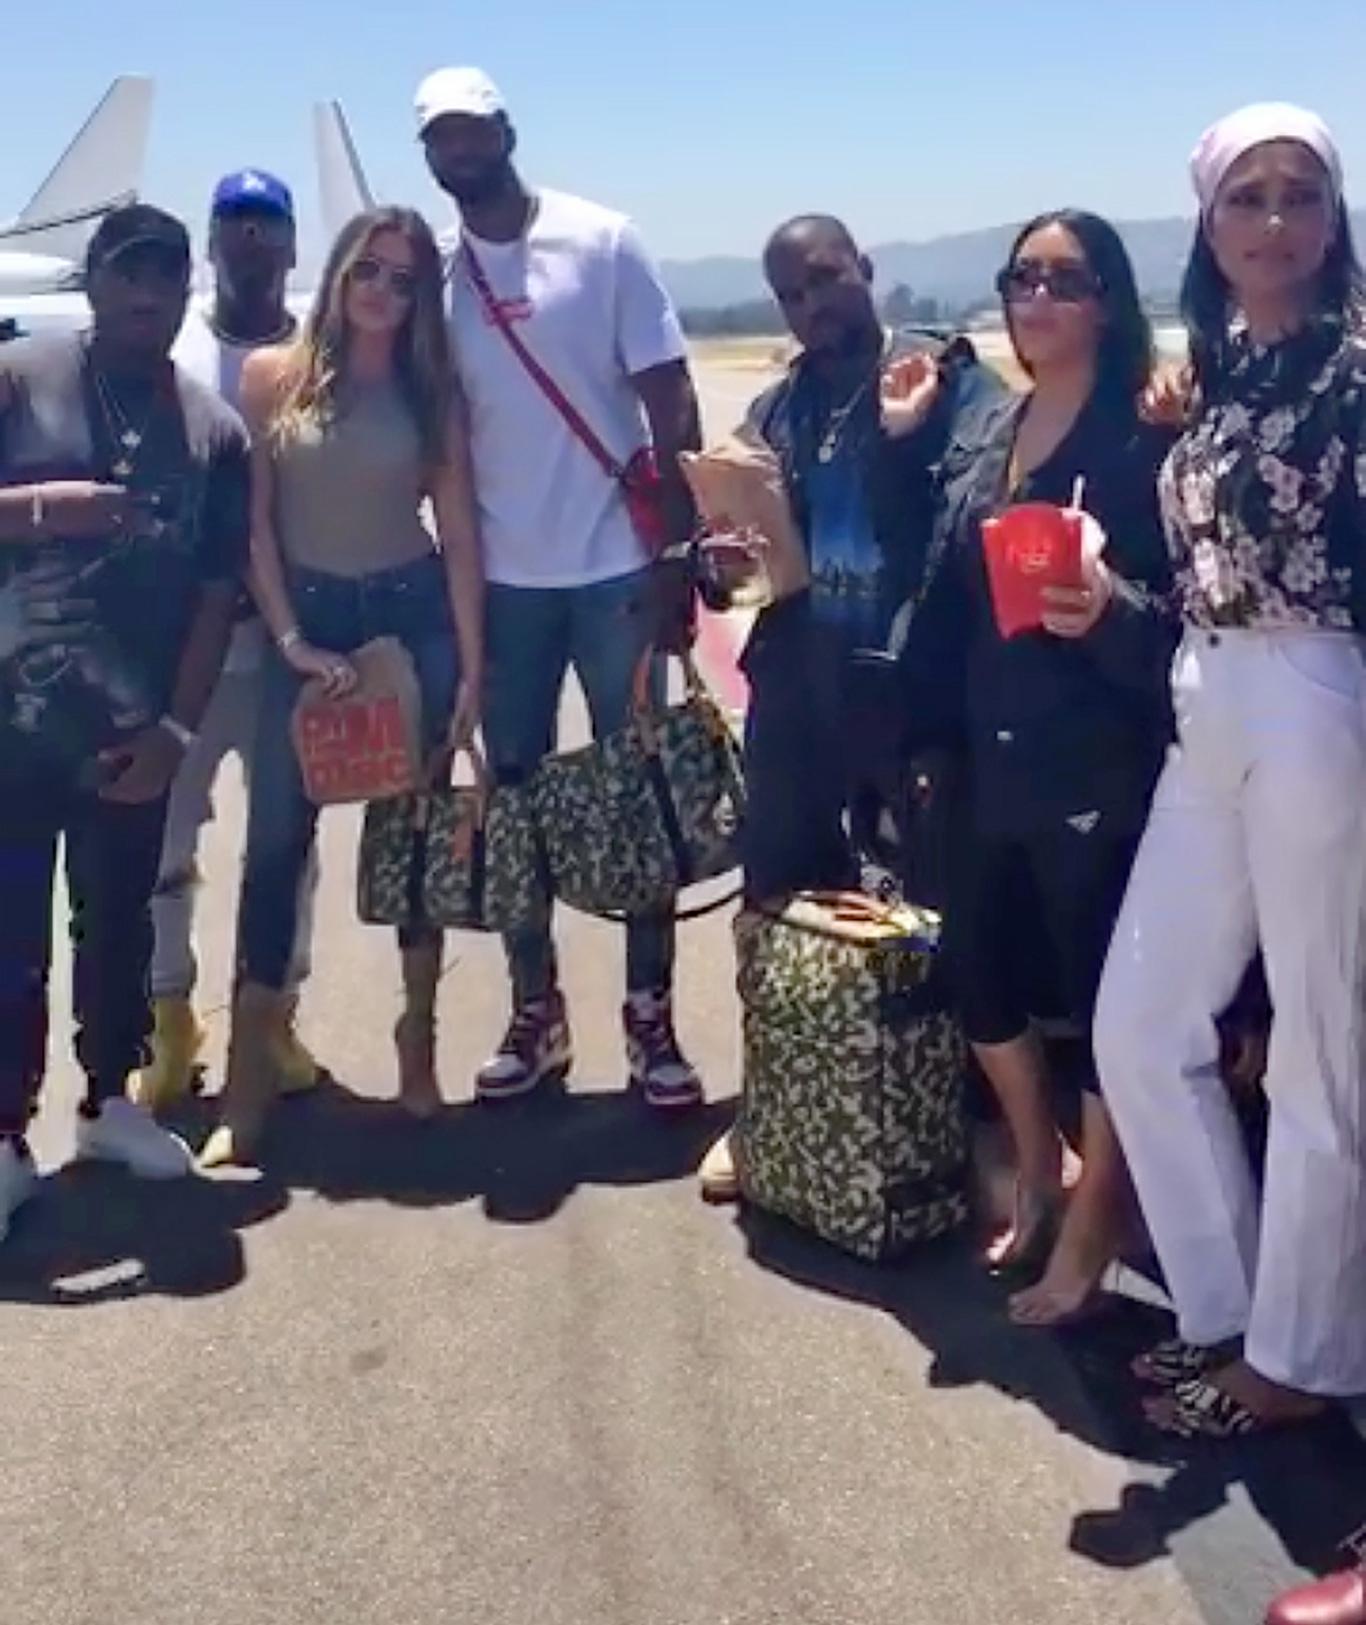 Khloe Kardashian, Tristan Thompson, Kanye West, Kim Kardashian and Rachel Roy